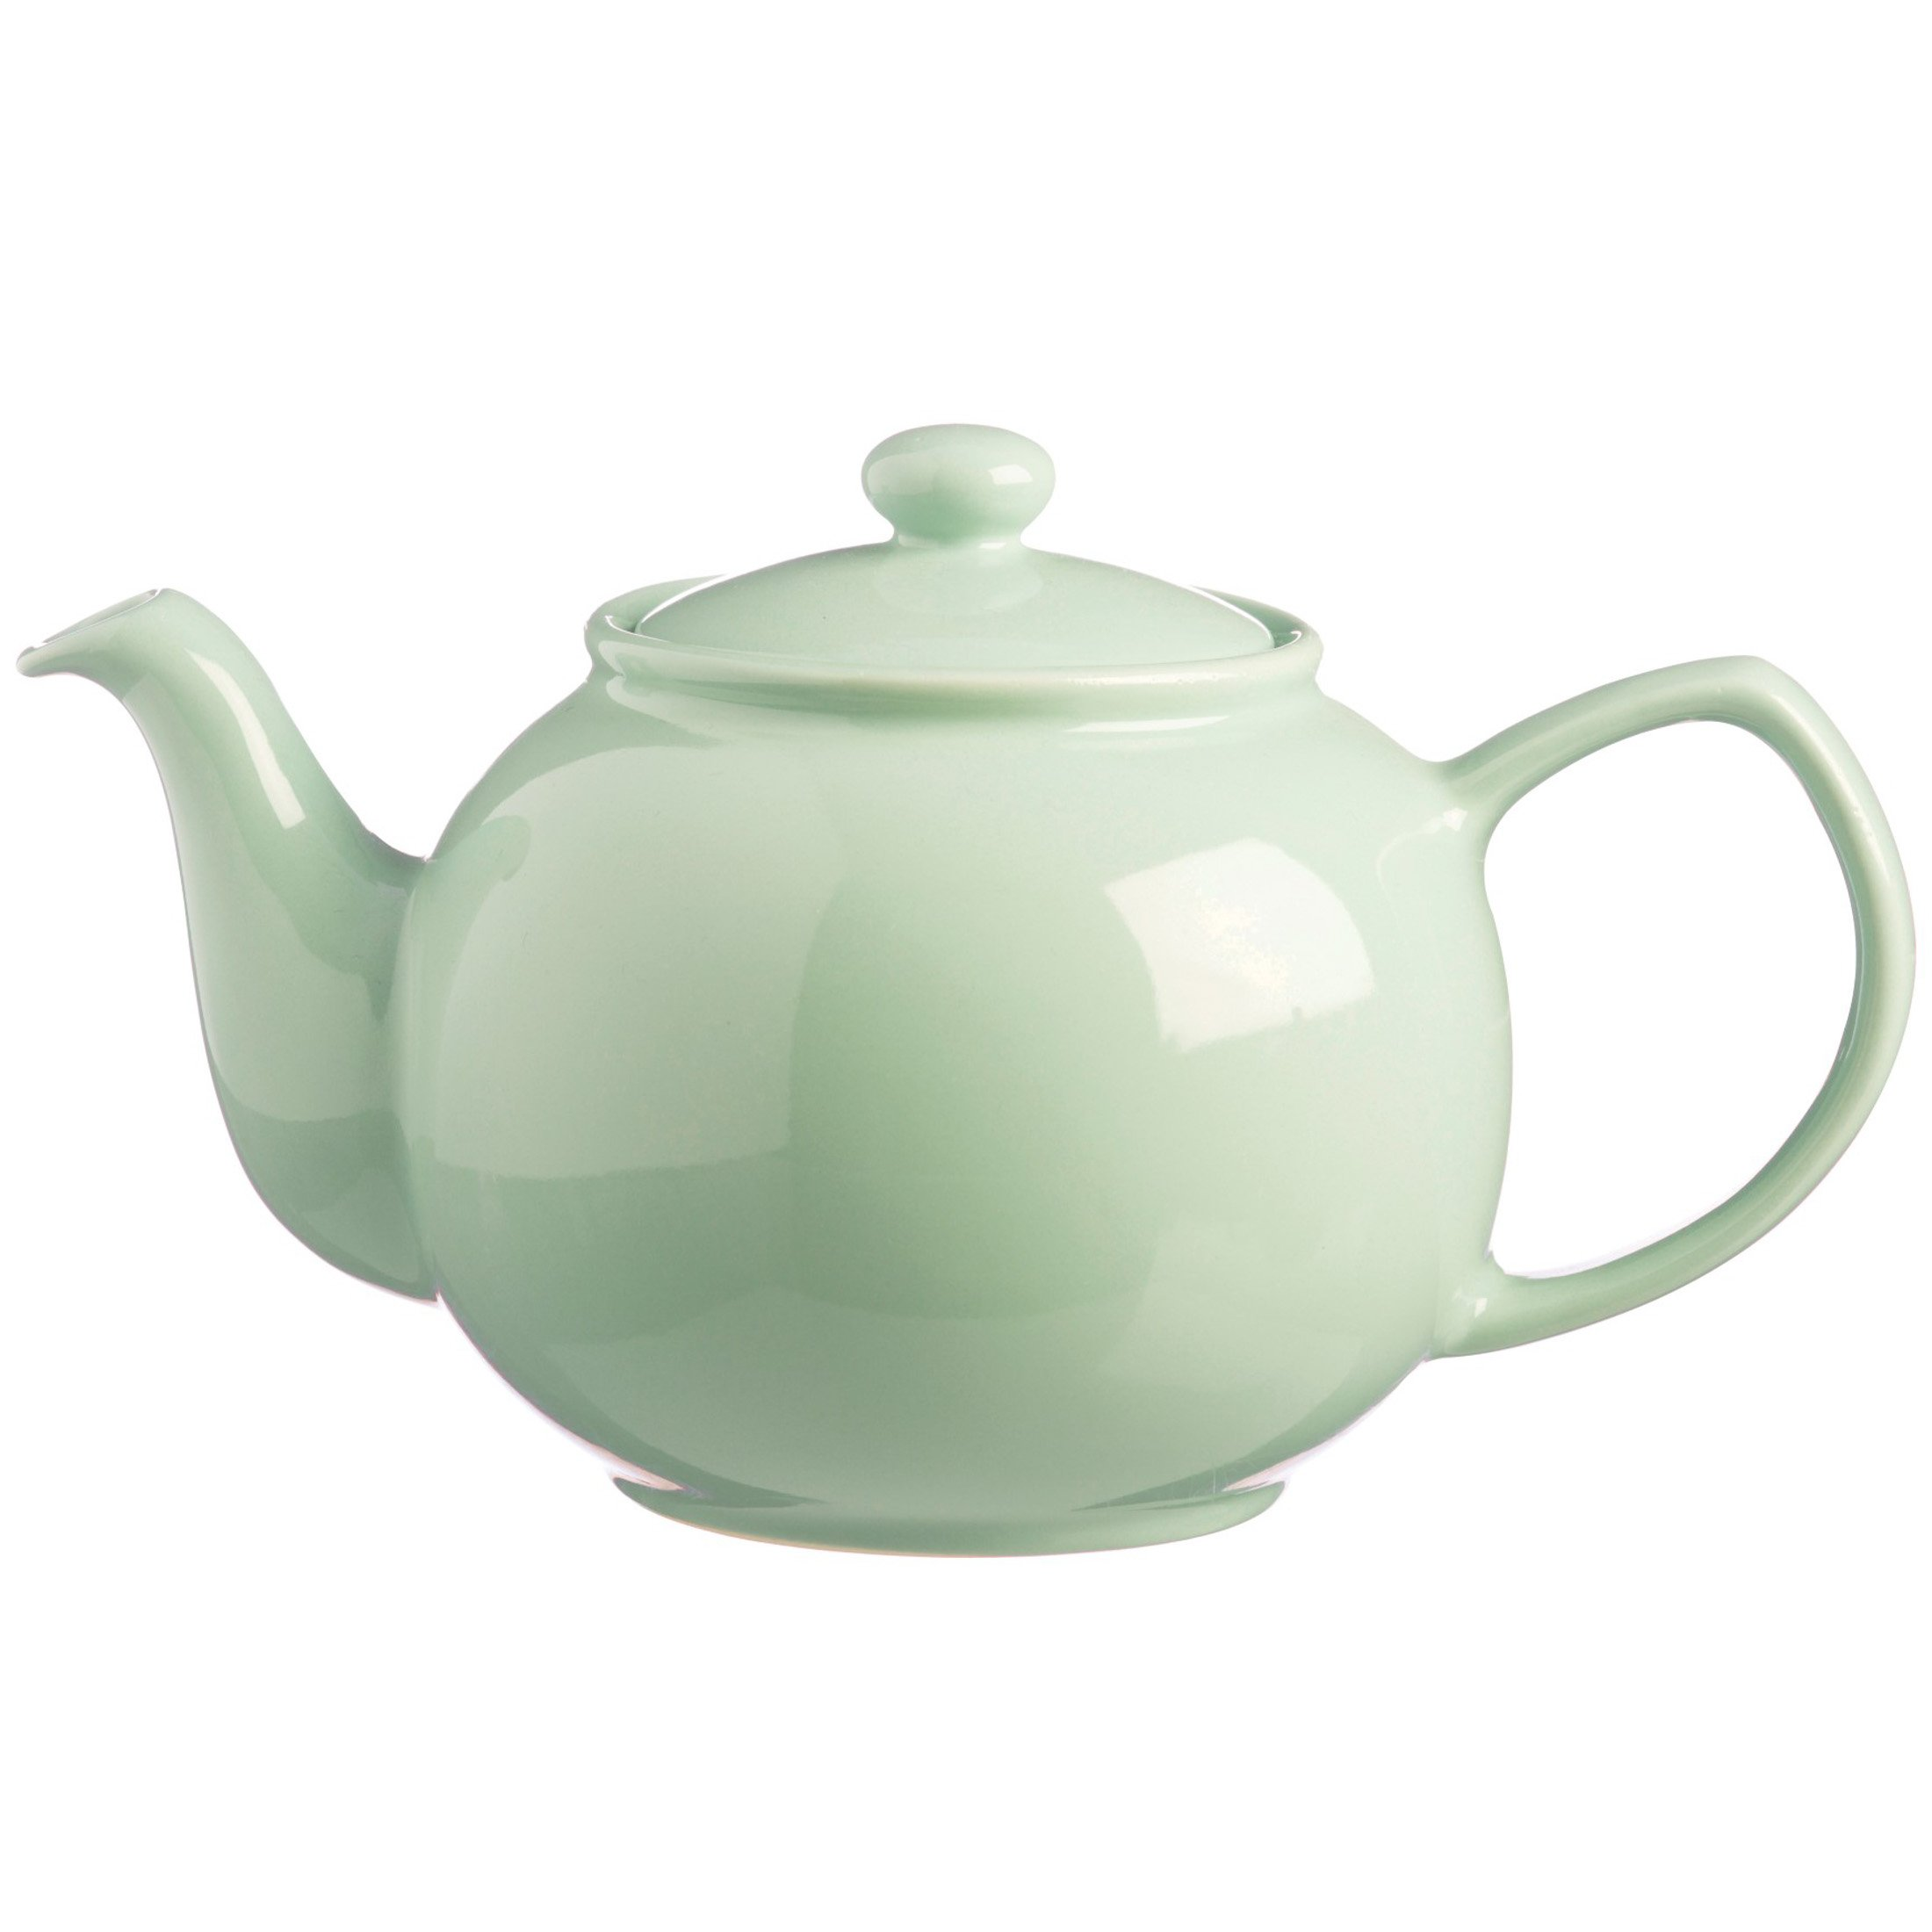 Price & Kensington Teapot 6 Cup, Mint